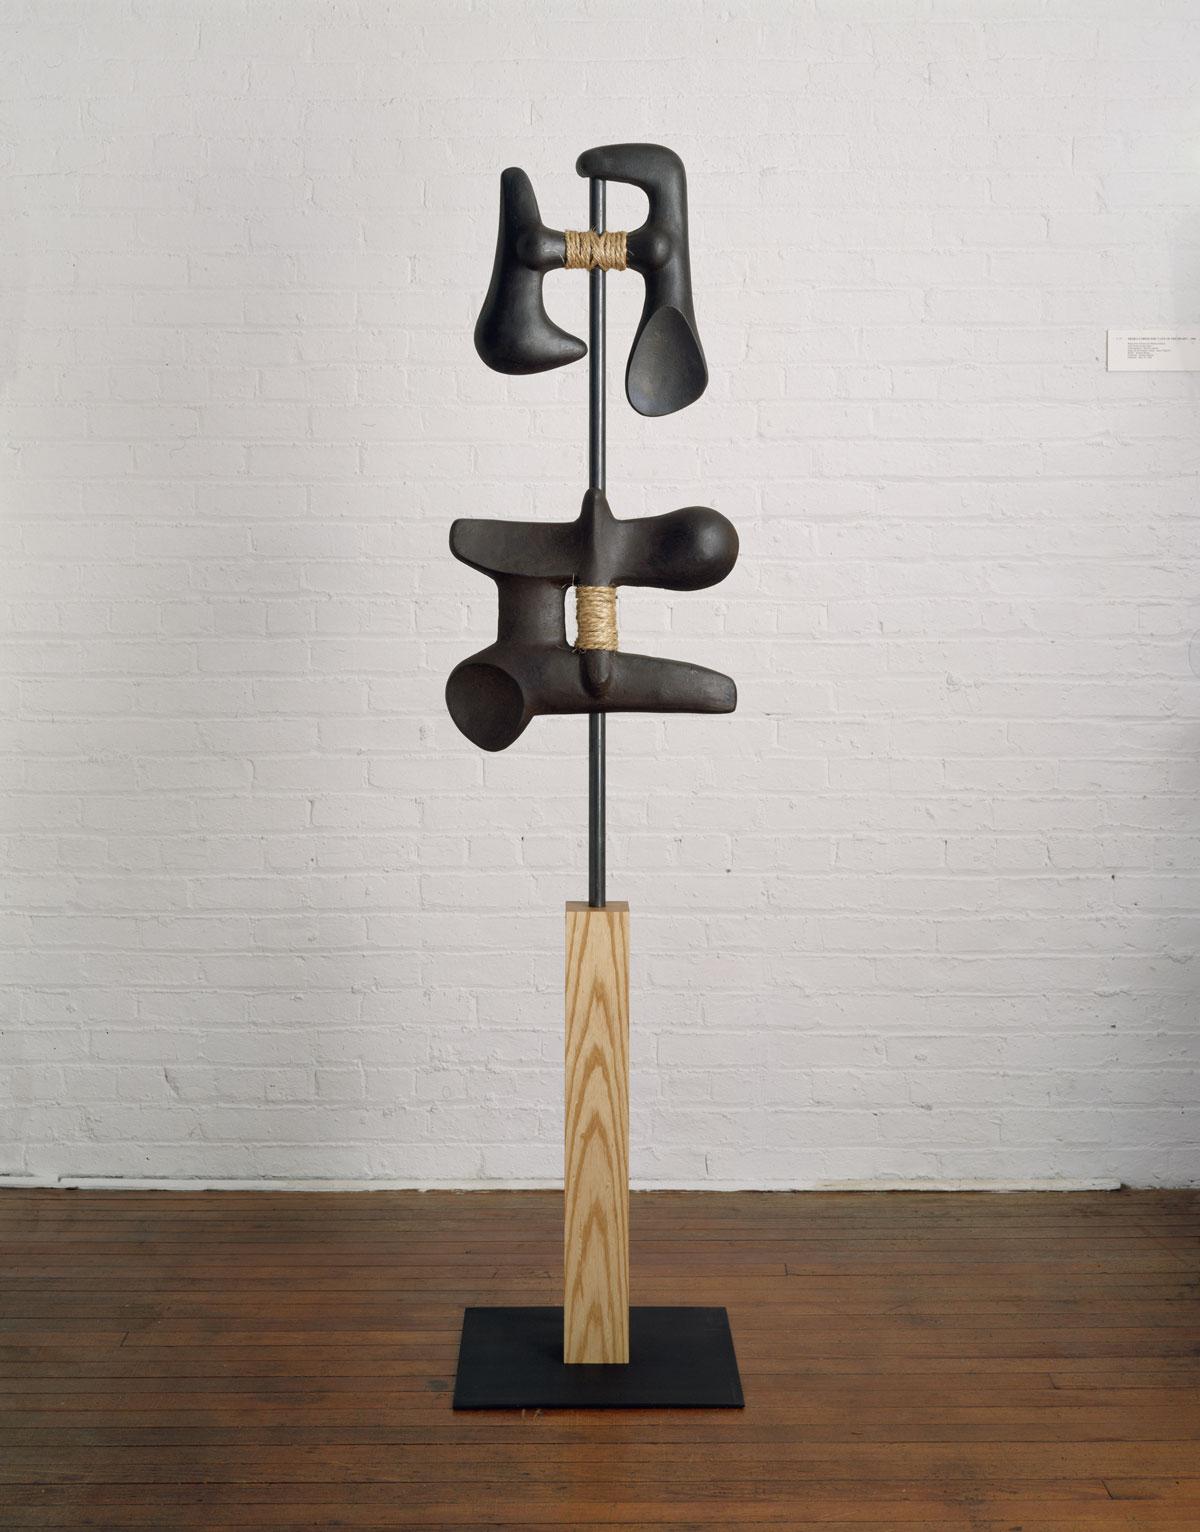 Isamu Noguchi, 'Calligraphics,' 1957.